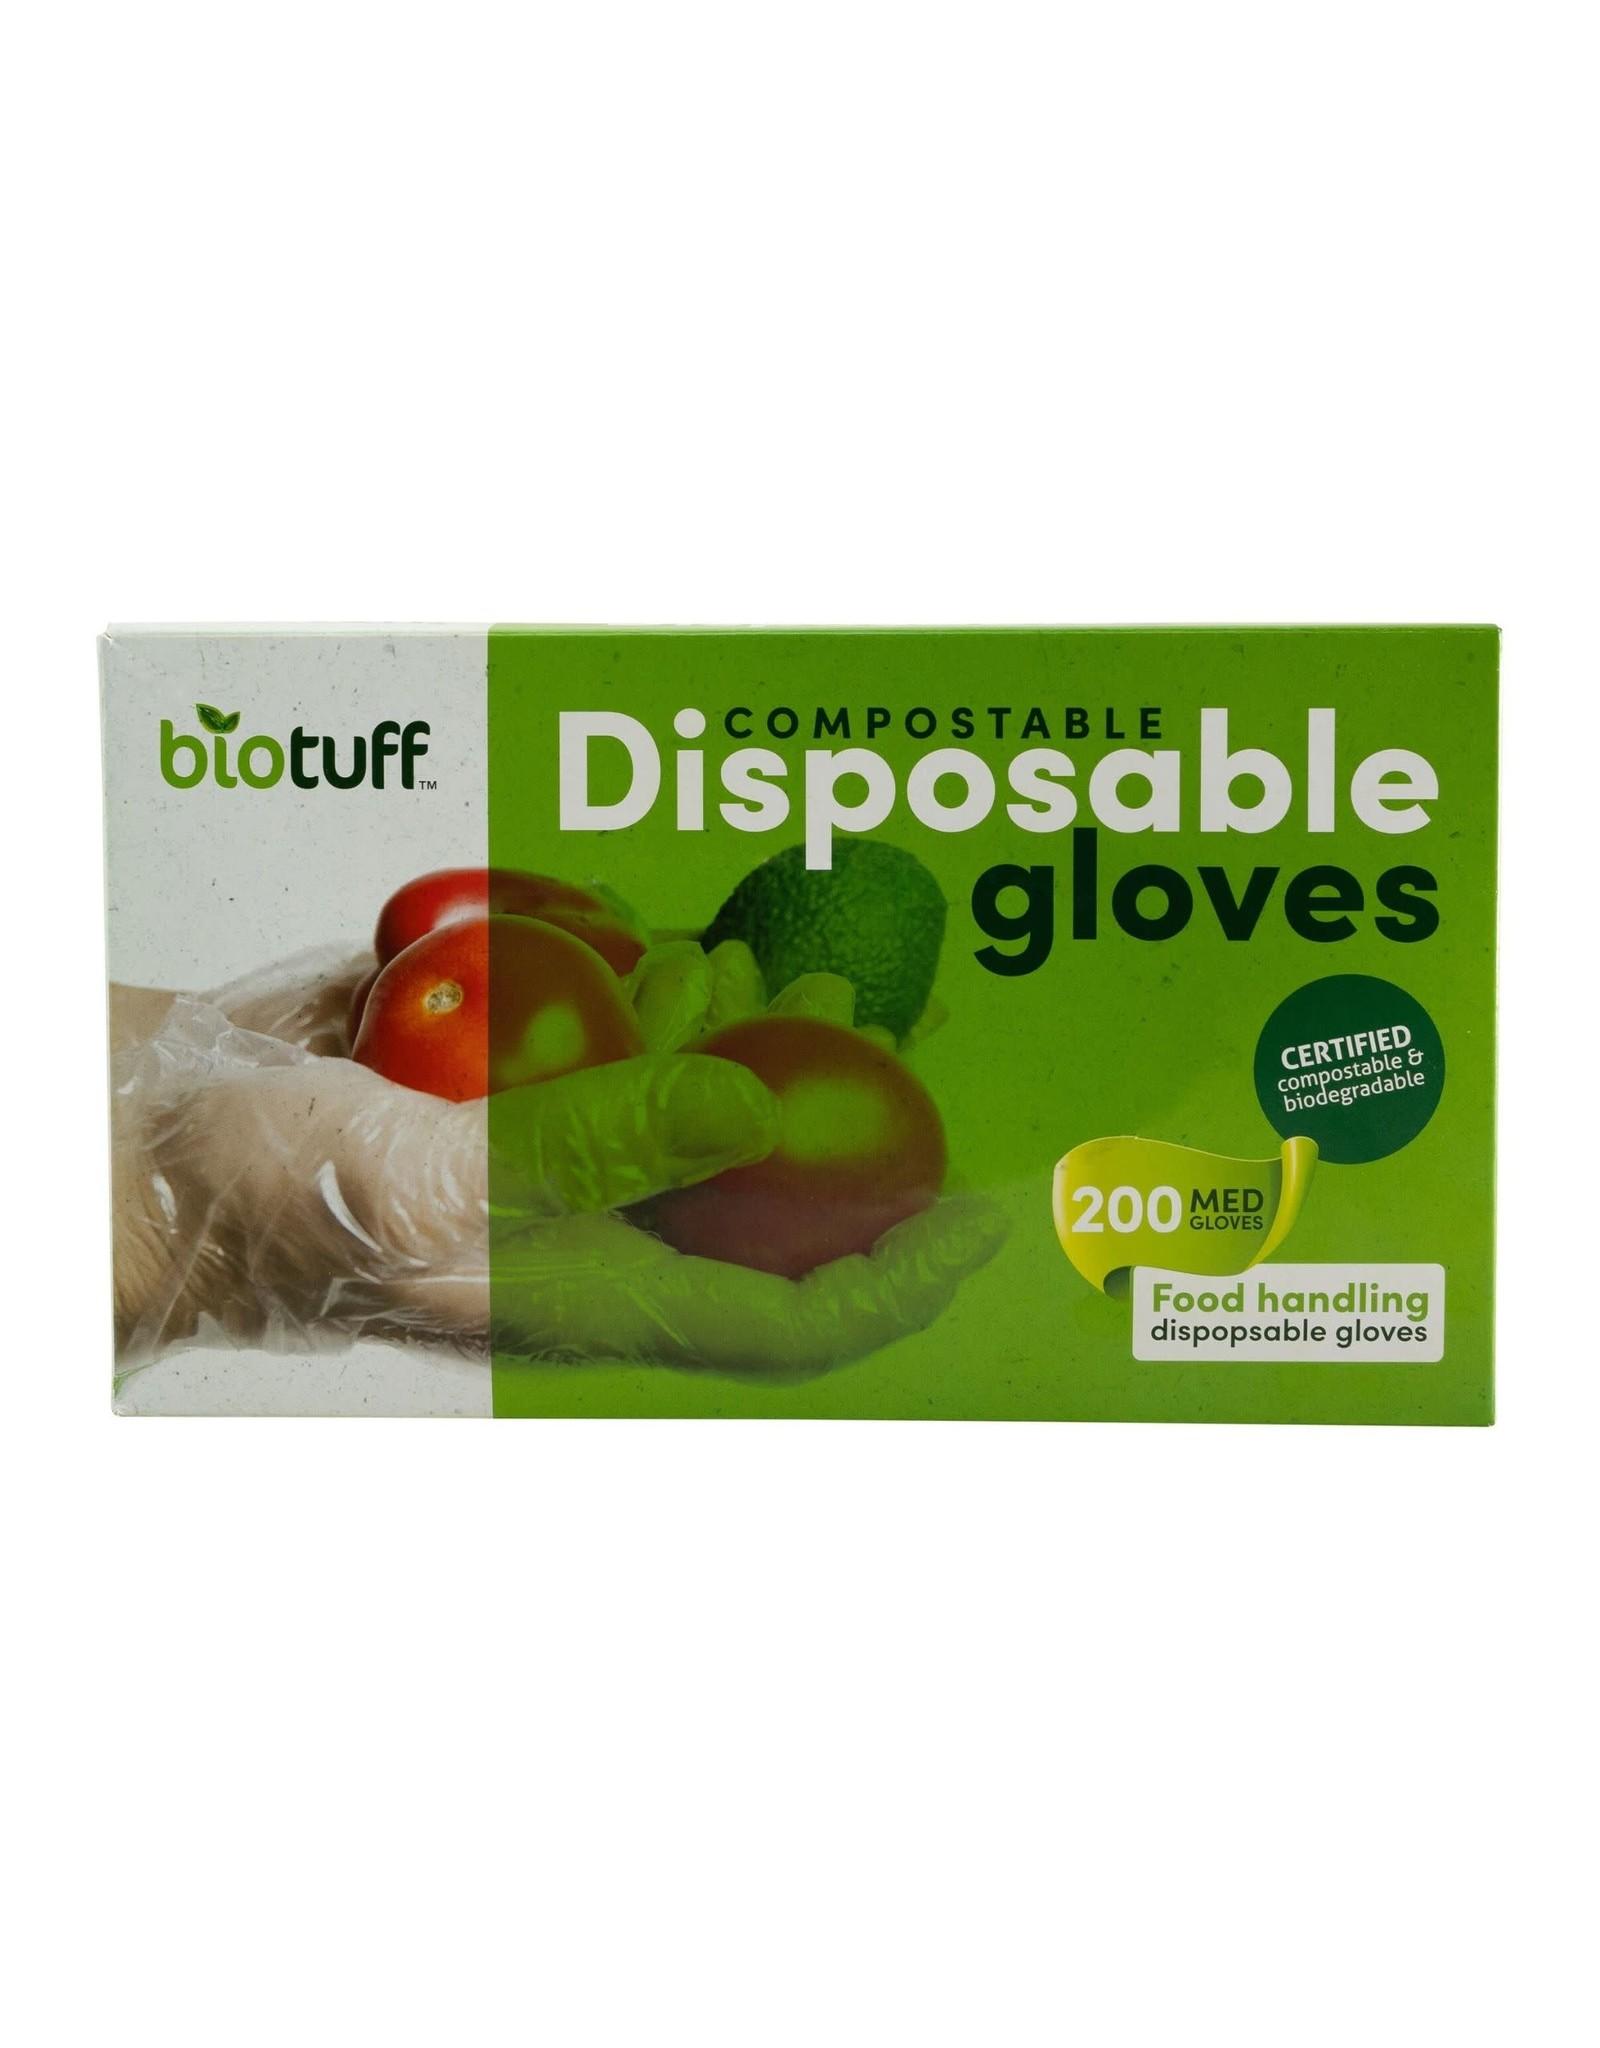 Biotuff Compostable Disposable Gloves Medium 200pk